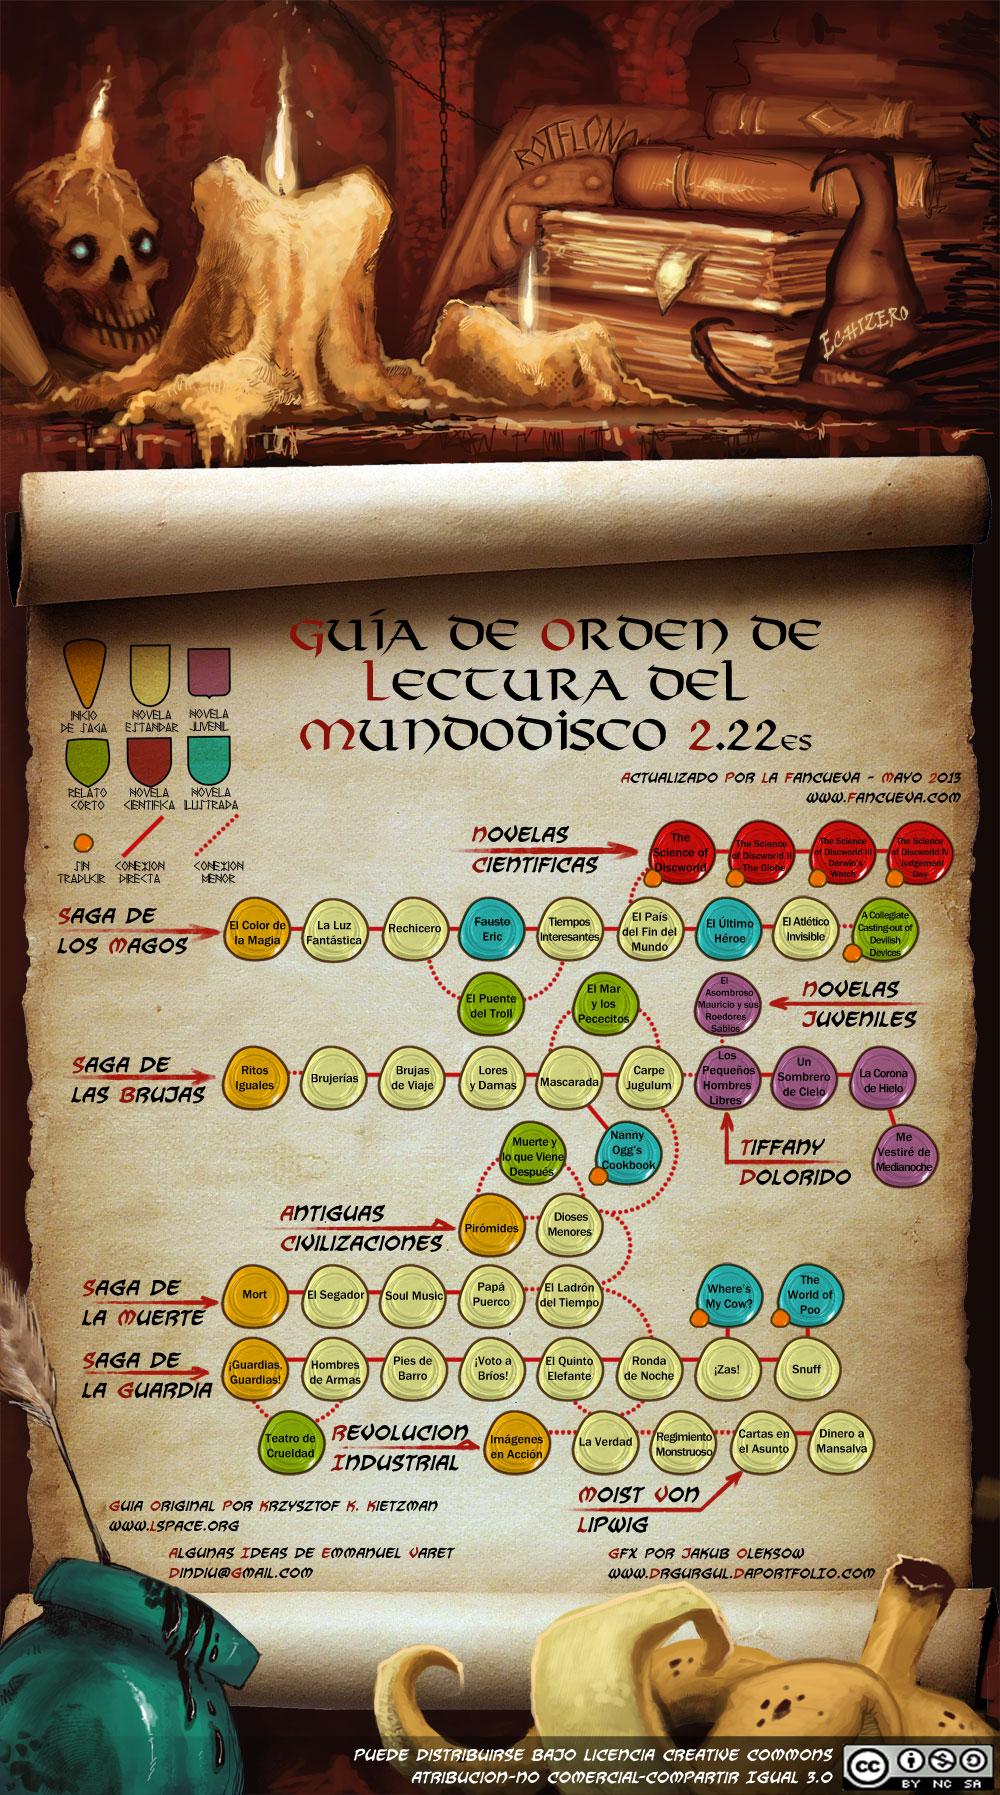 [Imagen: Guia-de-Orden-de-Lectura-del-Mundodisco-ES-2-22.jpg]